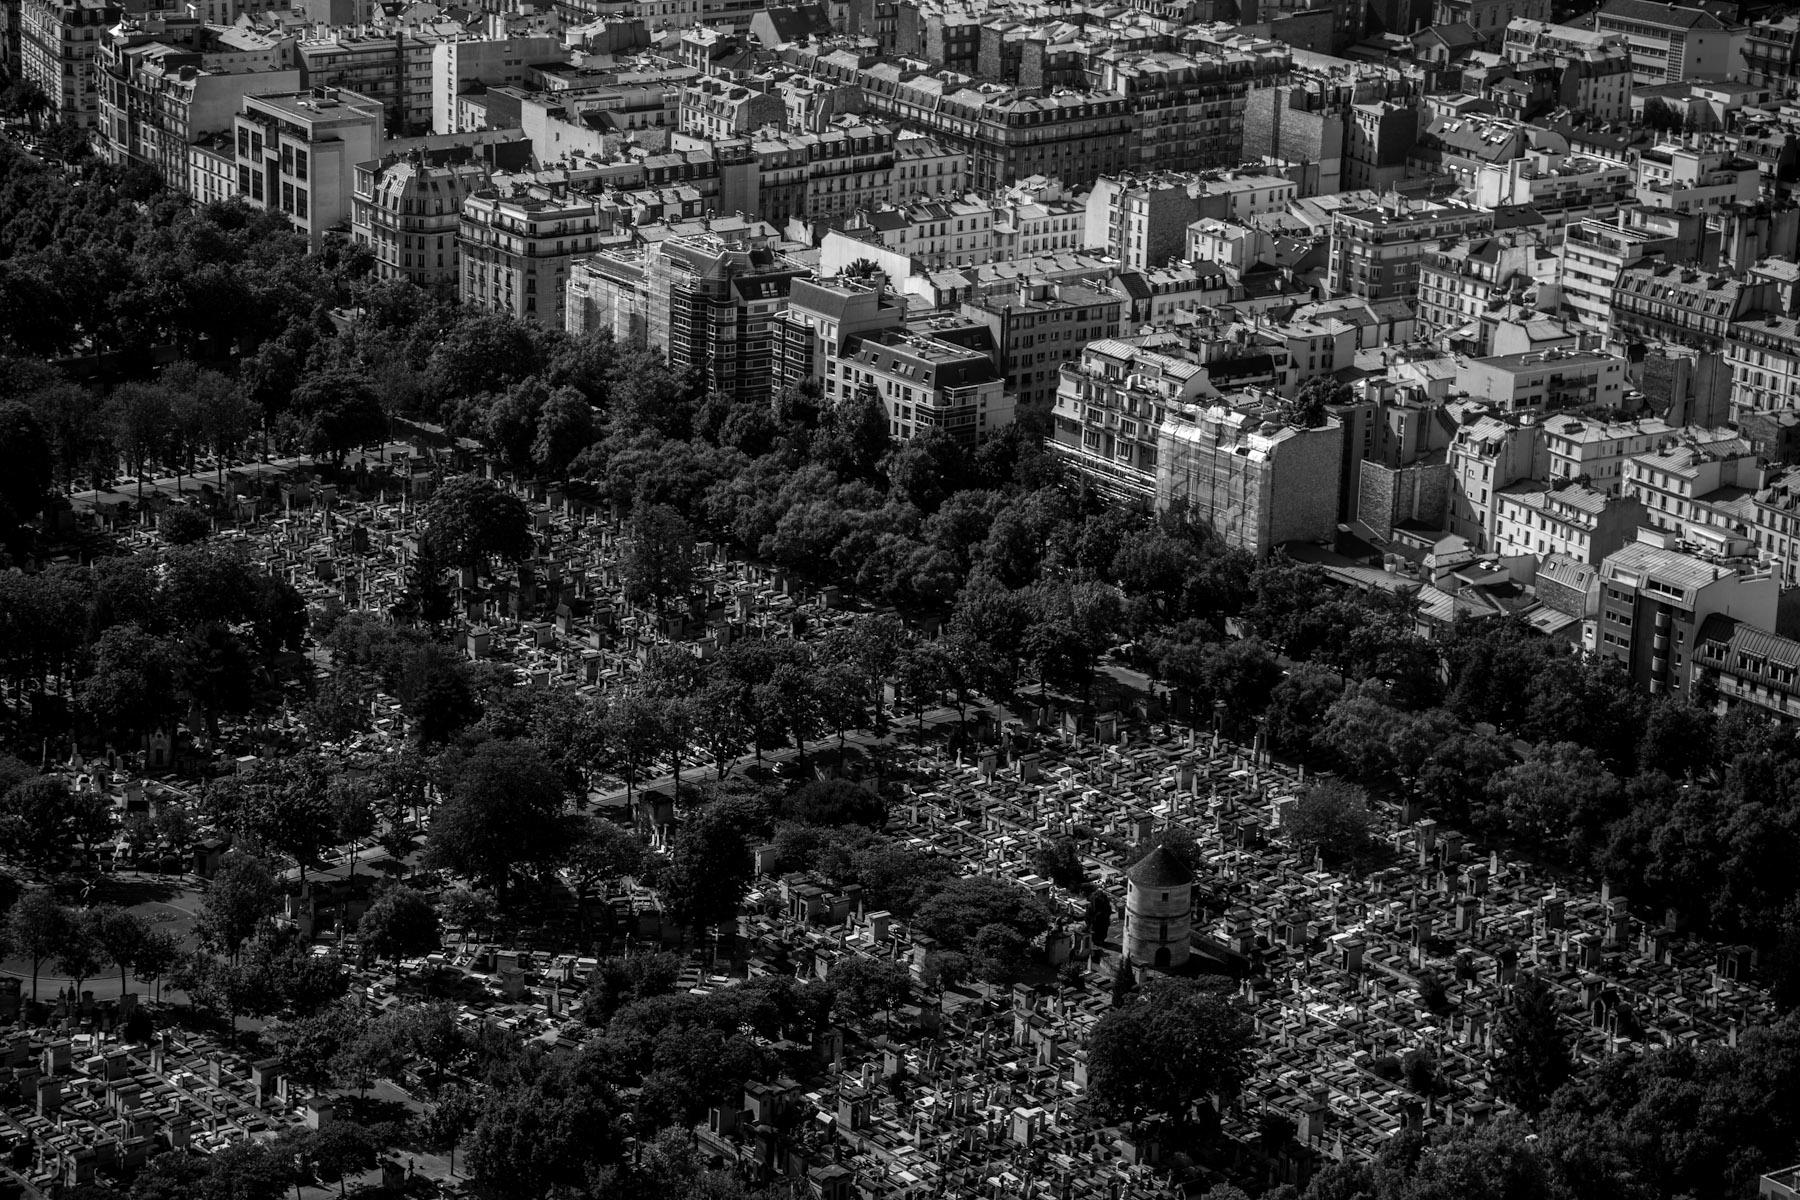 Il cimitero di Montparnasse a Parigi, visto dalla Tour de Montparnasse